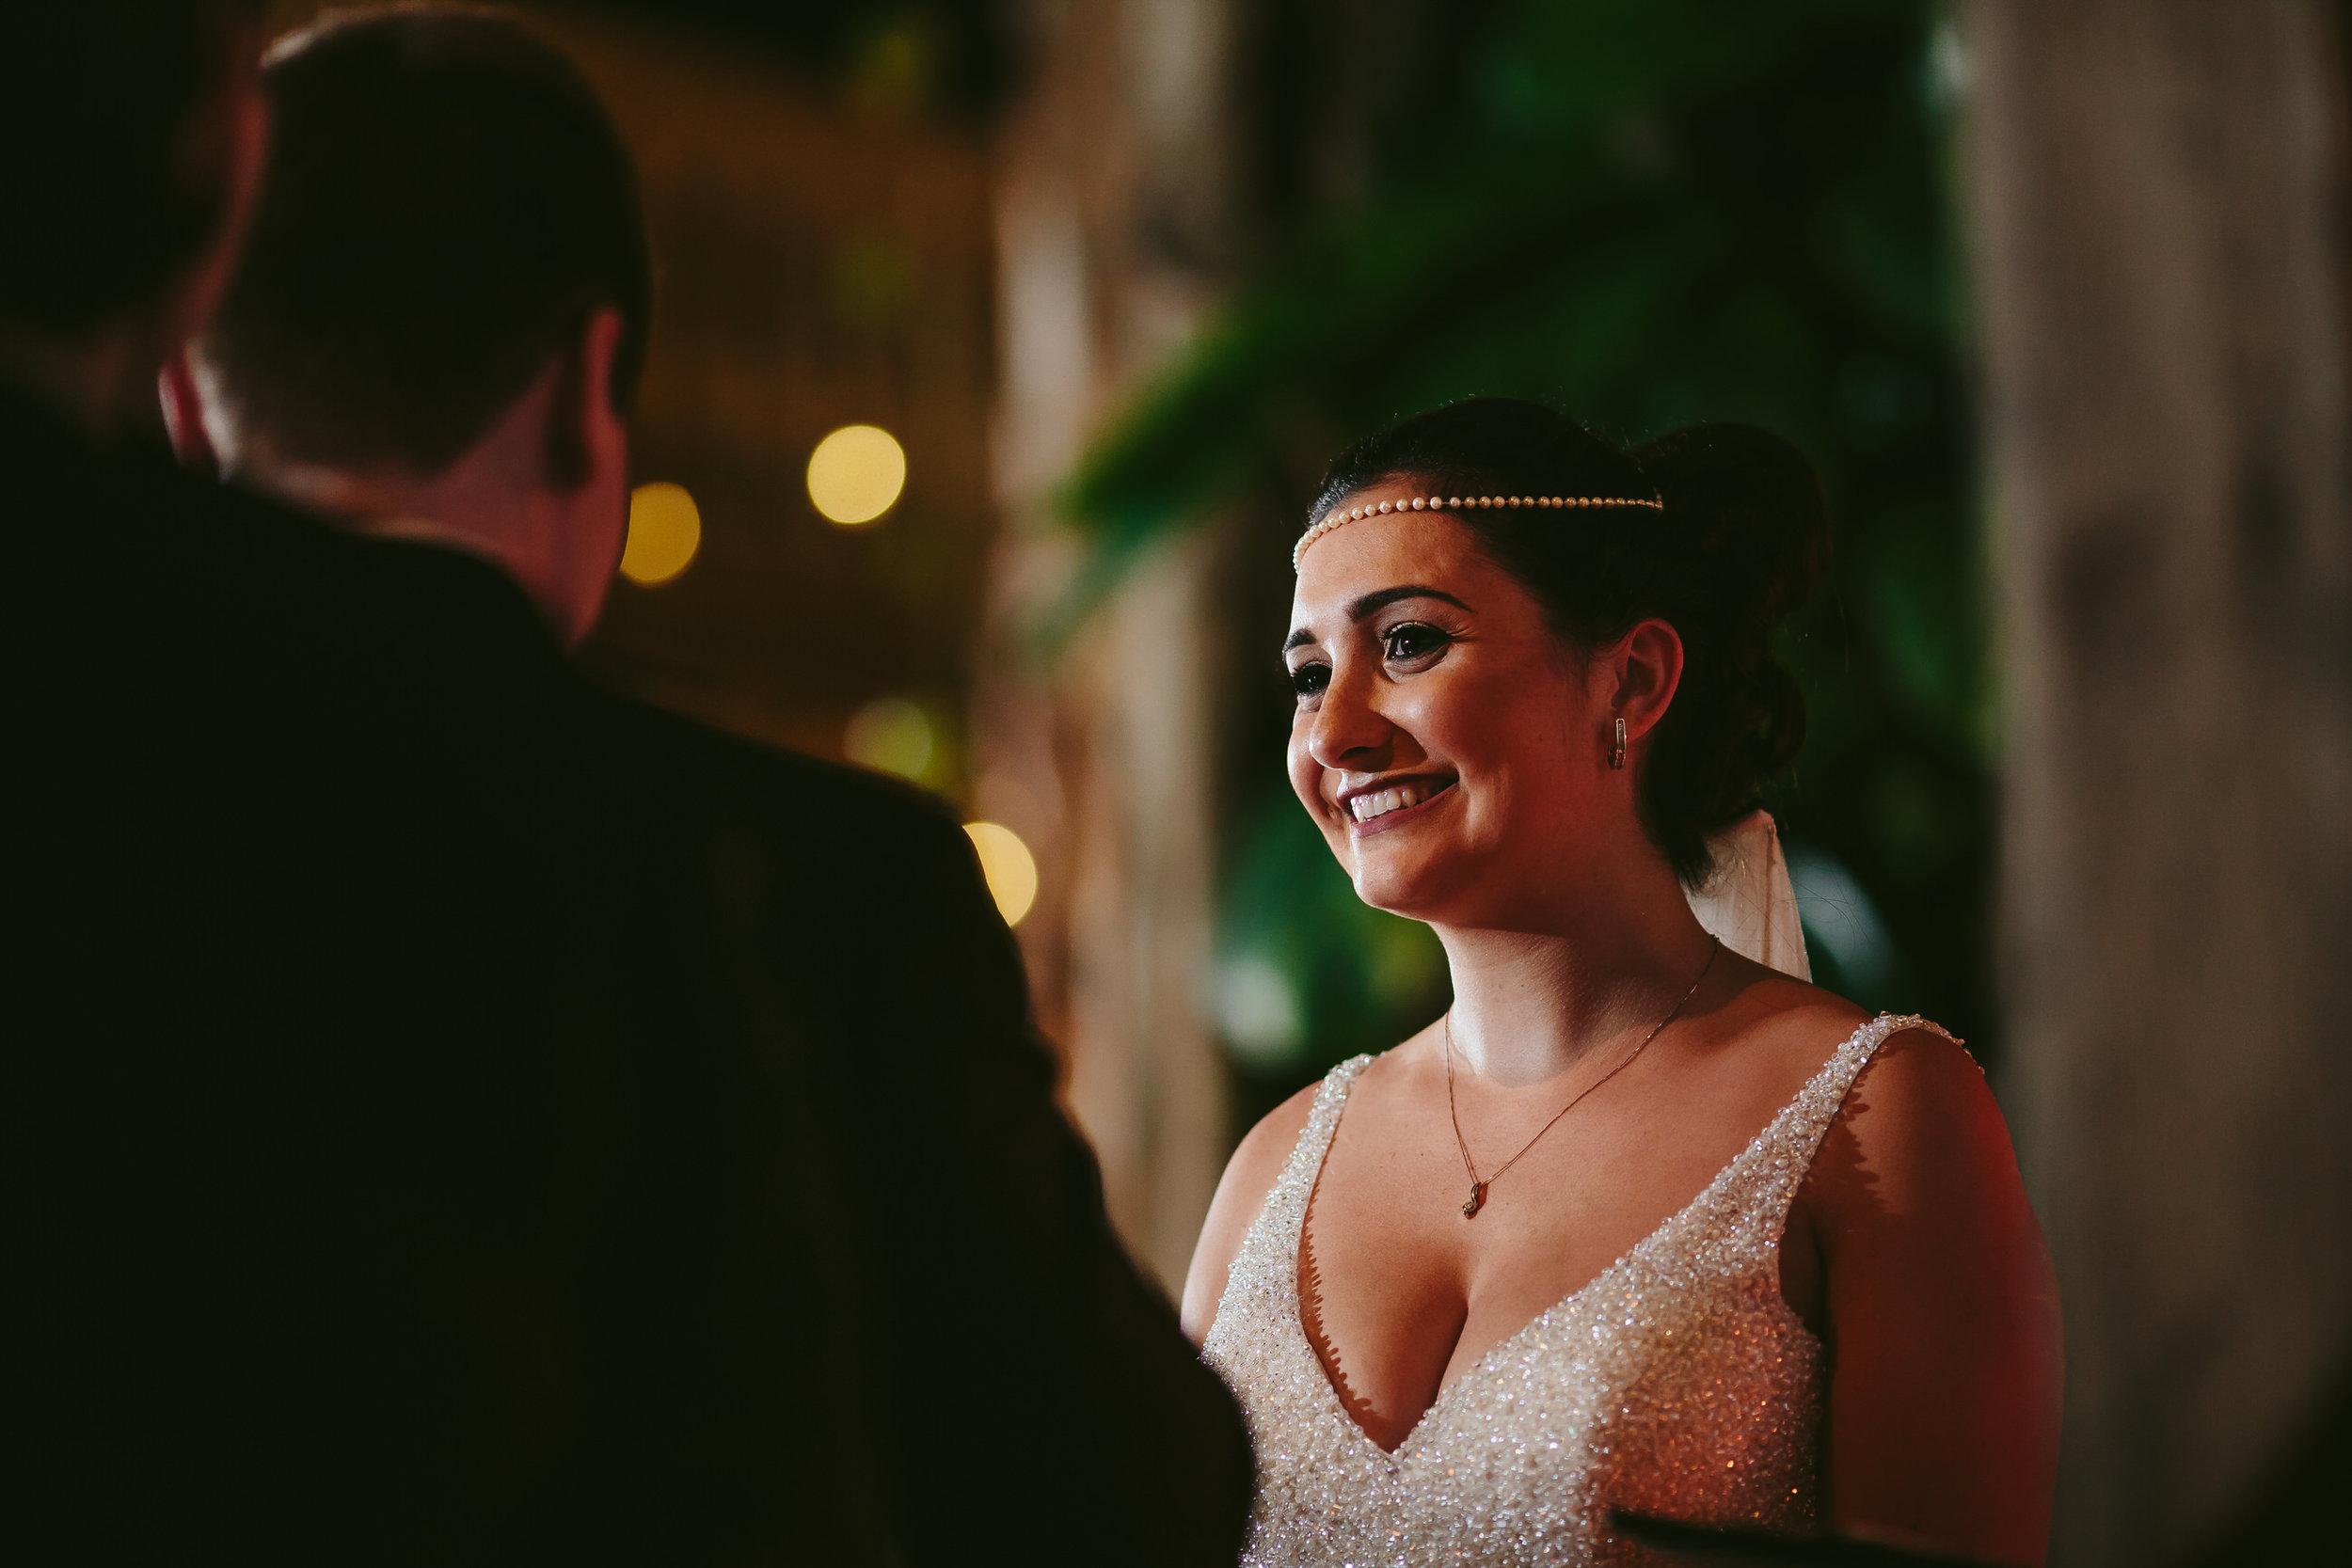 tiny_house_photo_wedding_ceremony_moments_the_addison_boca_raton.jpg